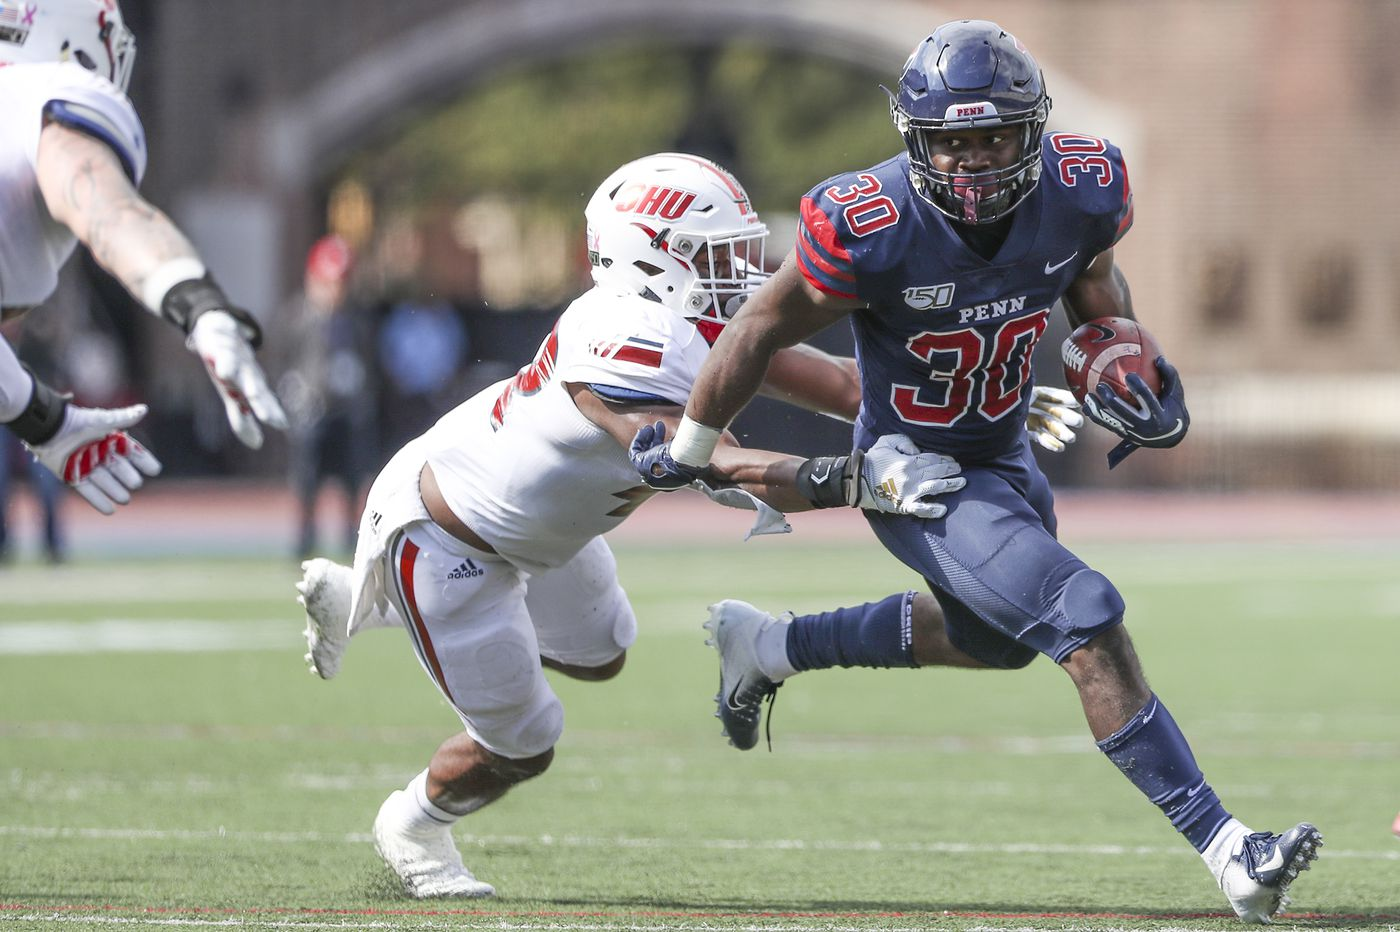 Karekin Brooks' career day leads Penn past Sacred Heart, 38-24